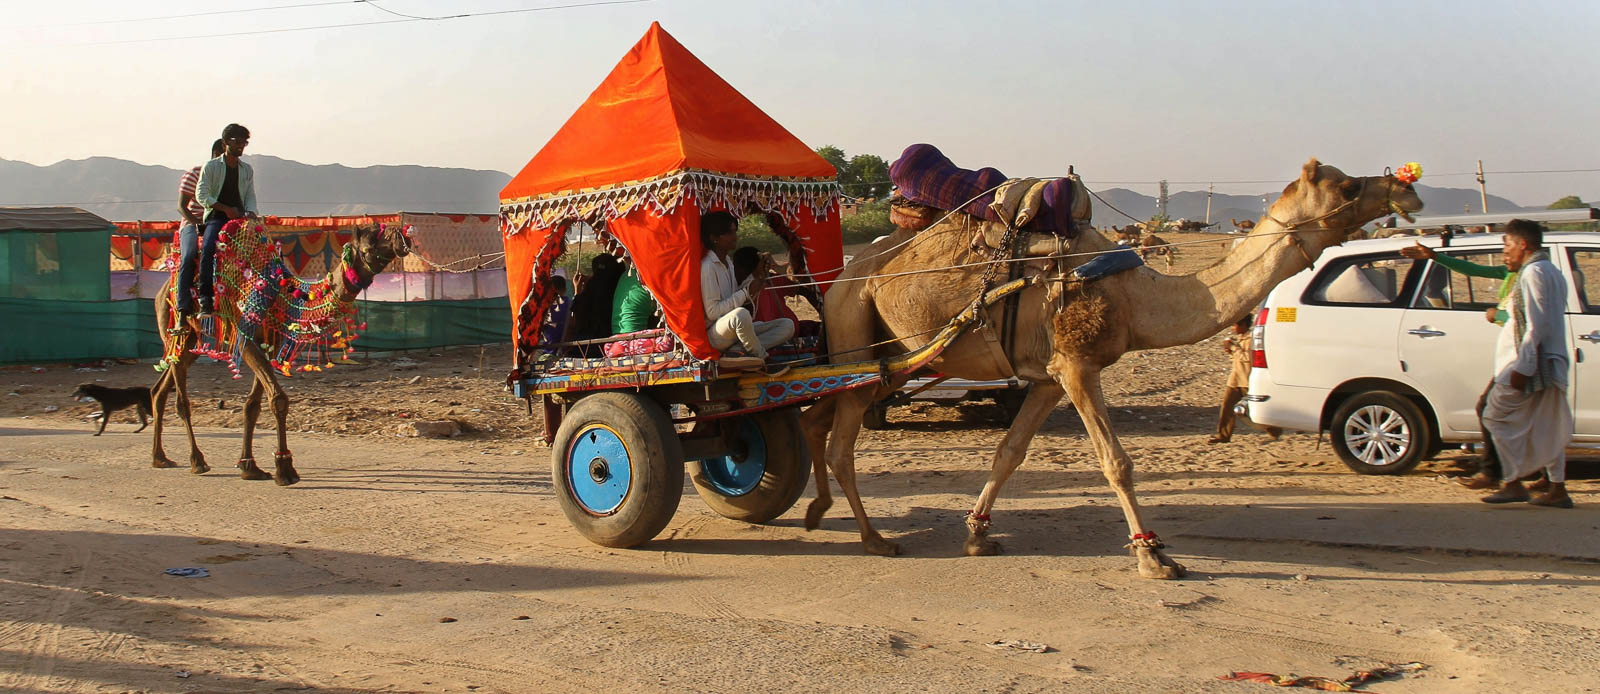 1023_Pushkar-camel-fair-14.jpg